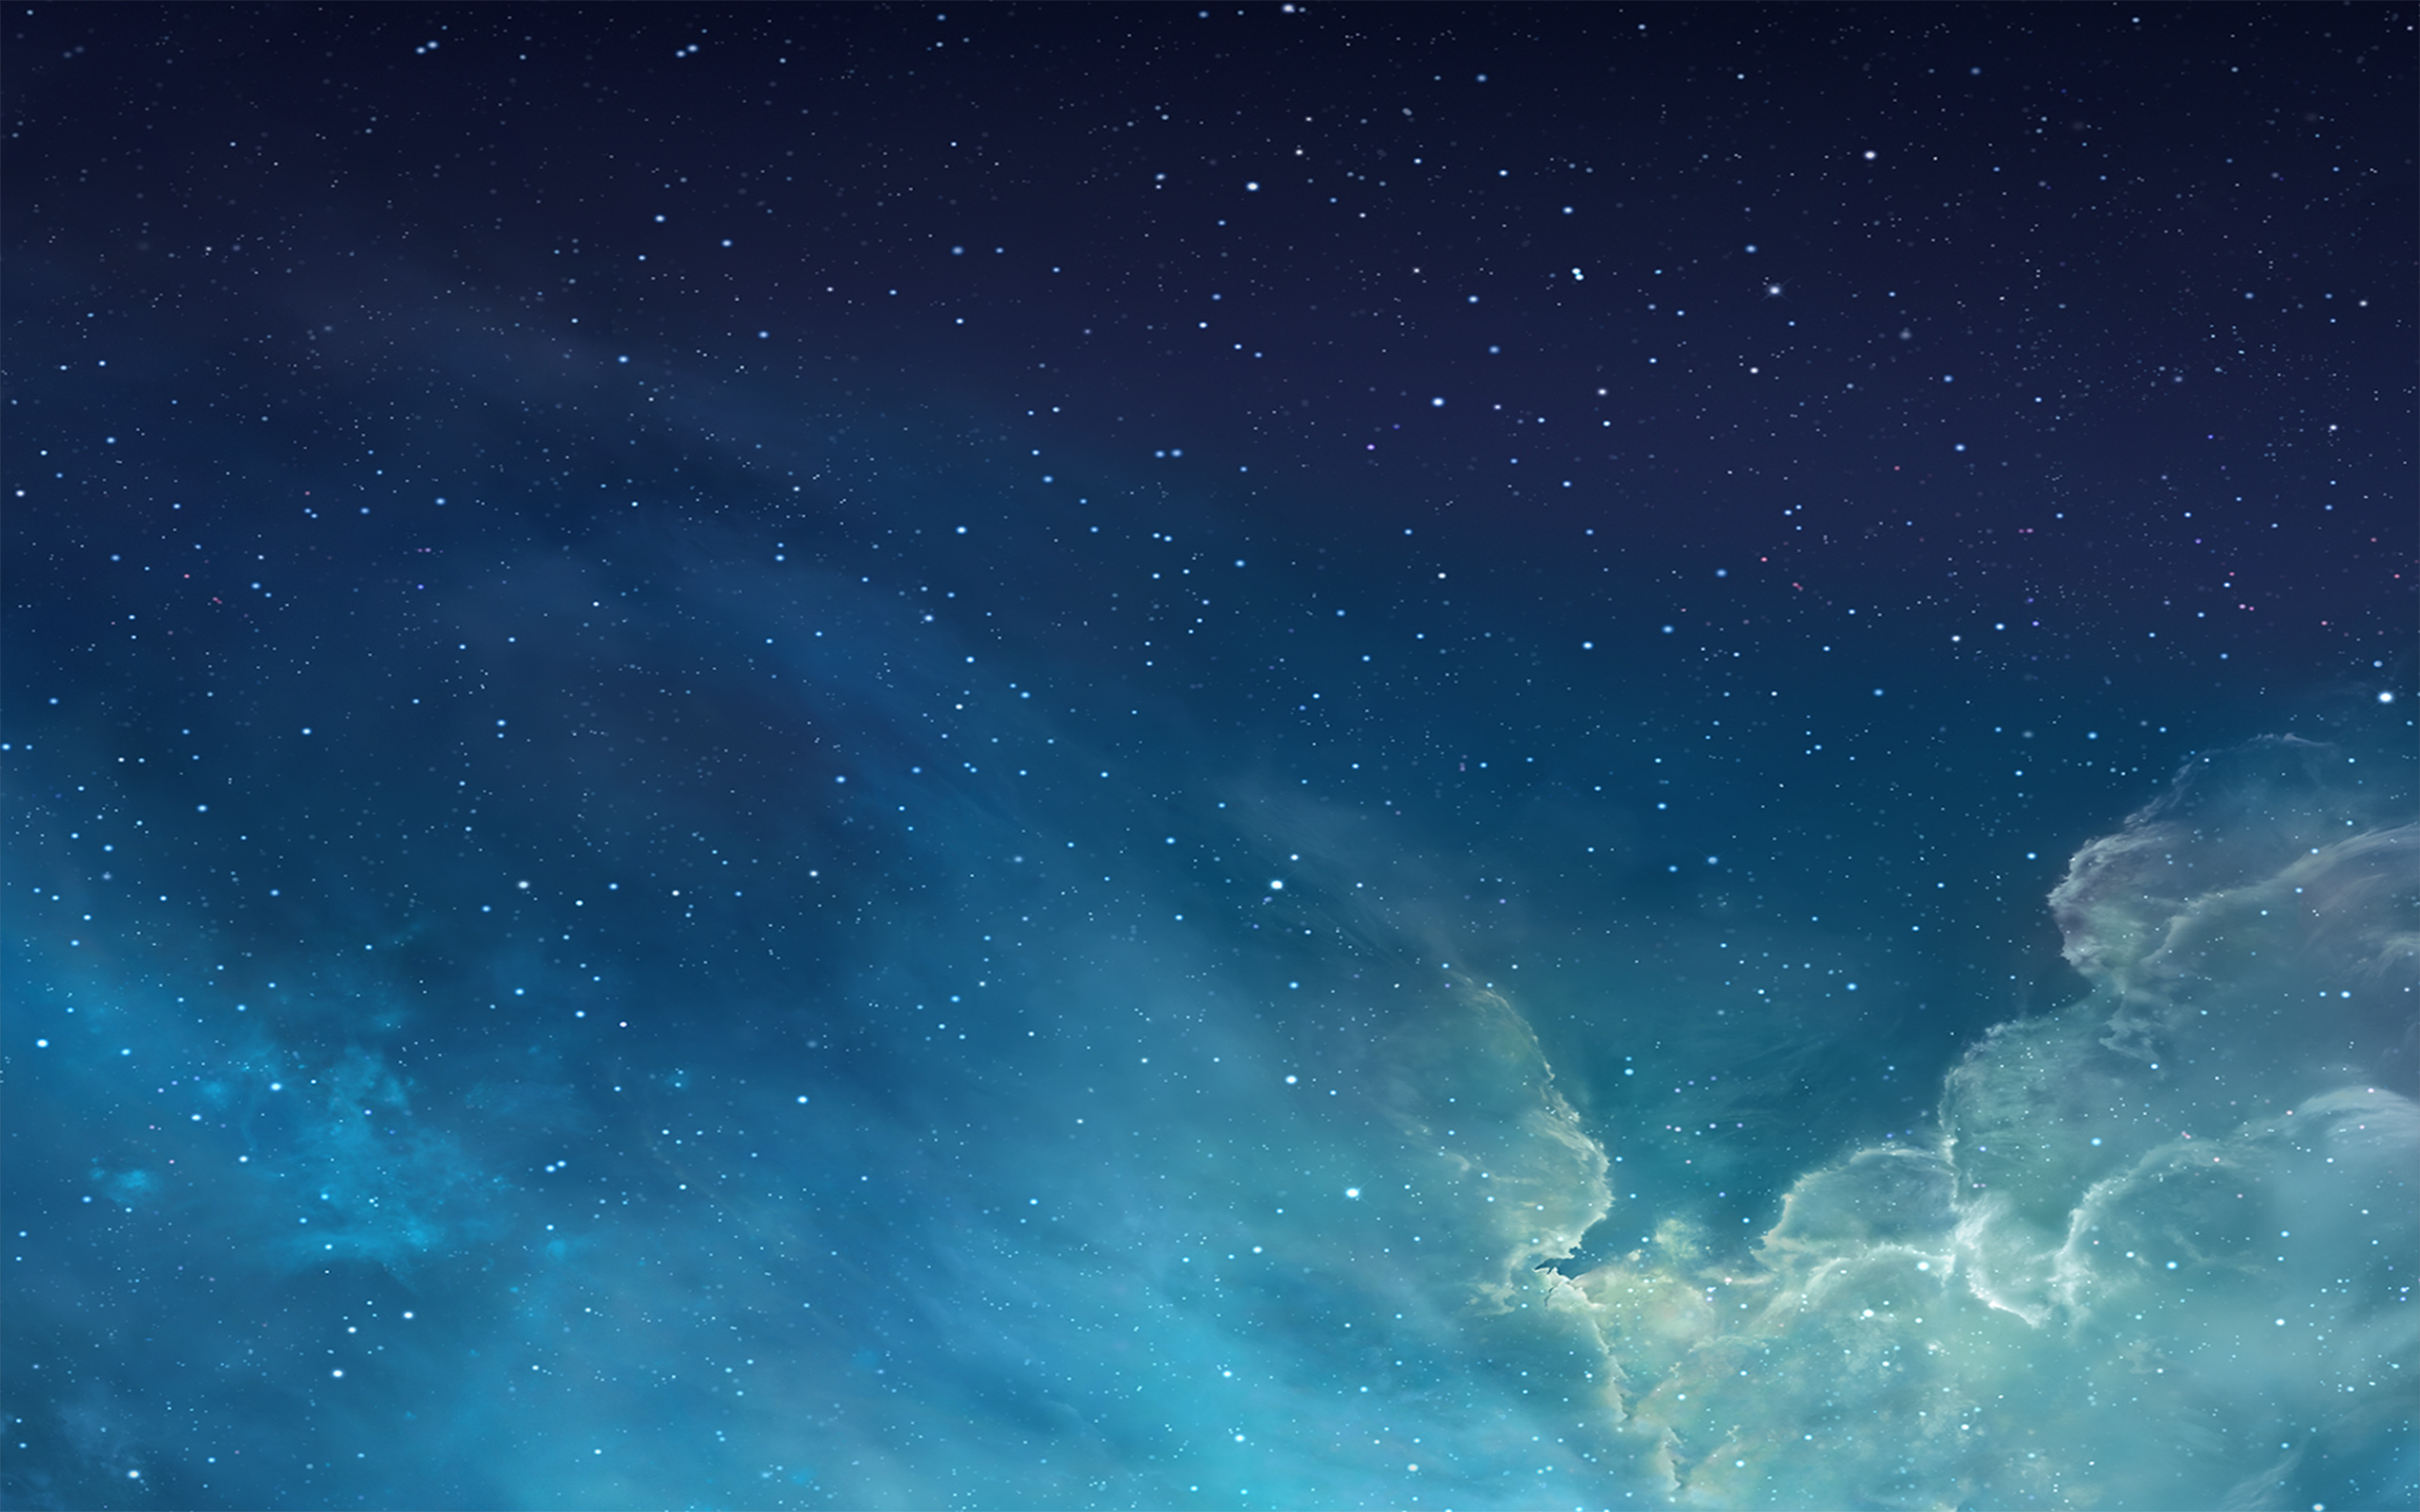 mac galaxy wallpaper - wallpapersafari